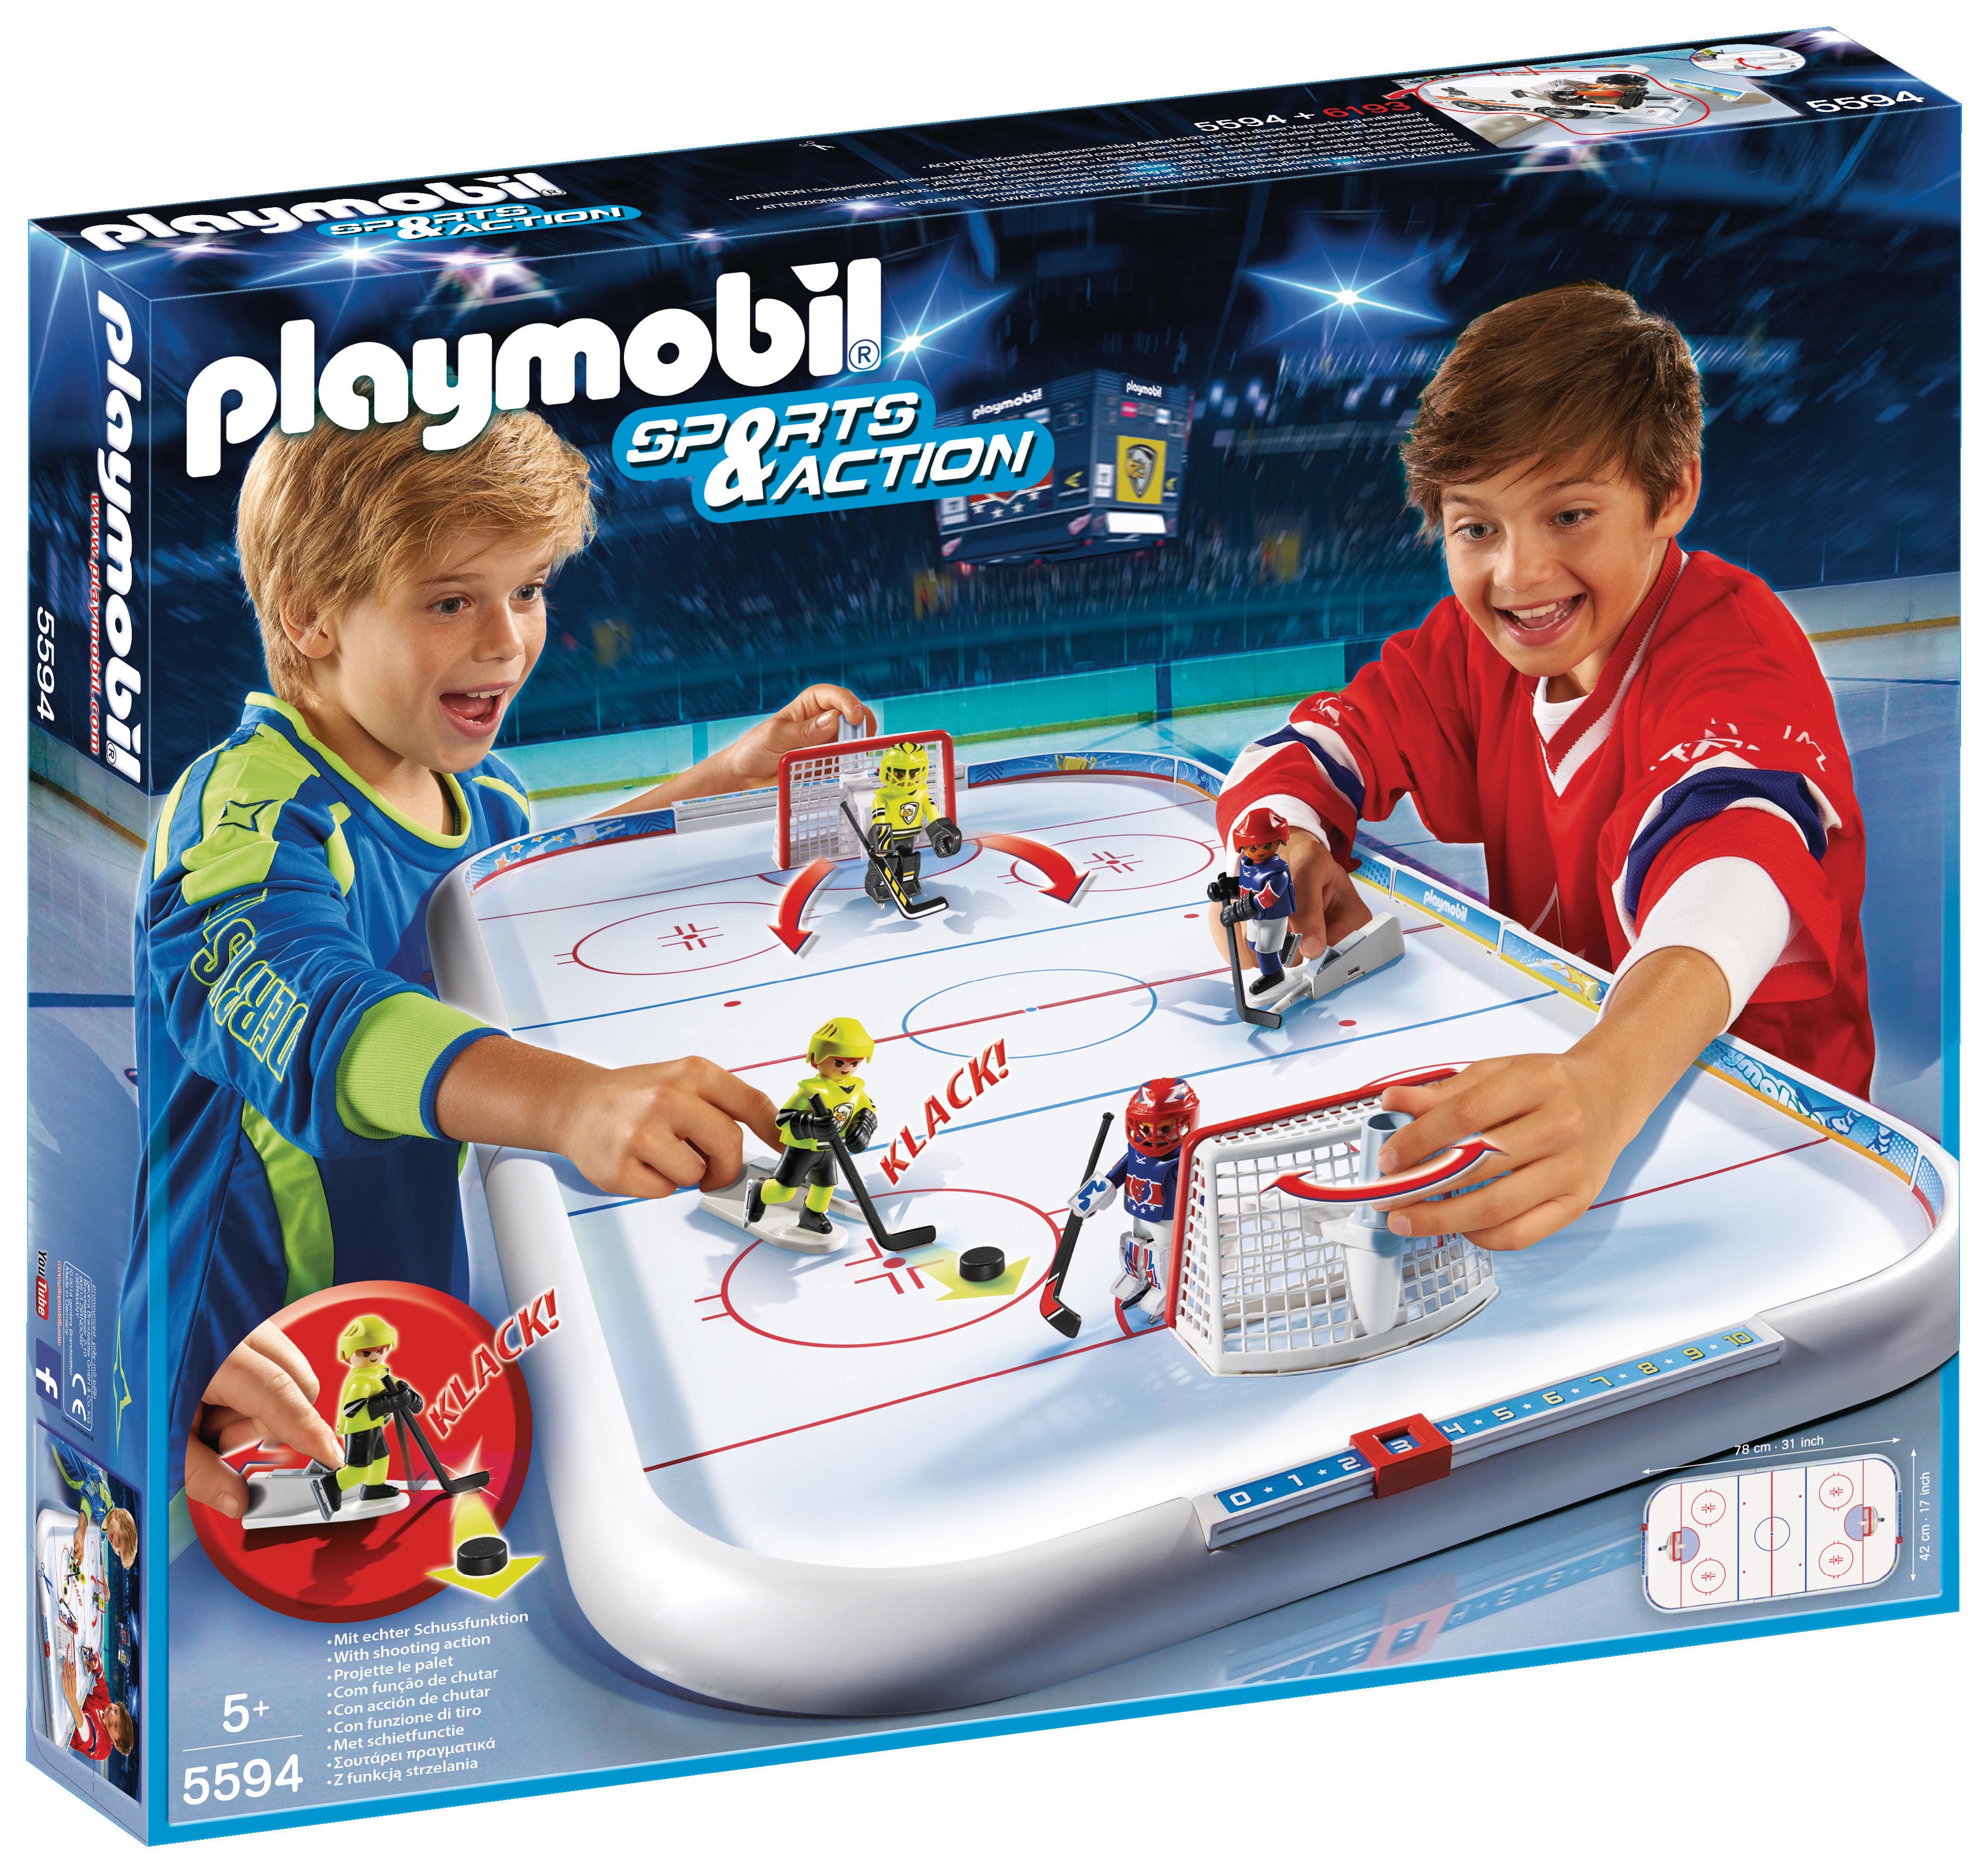 Stade de hockey sur glace - Playmobil - 5594